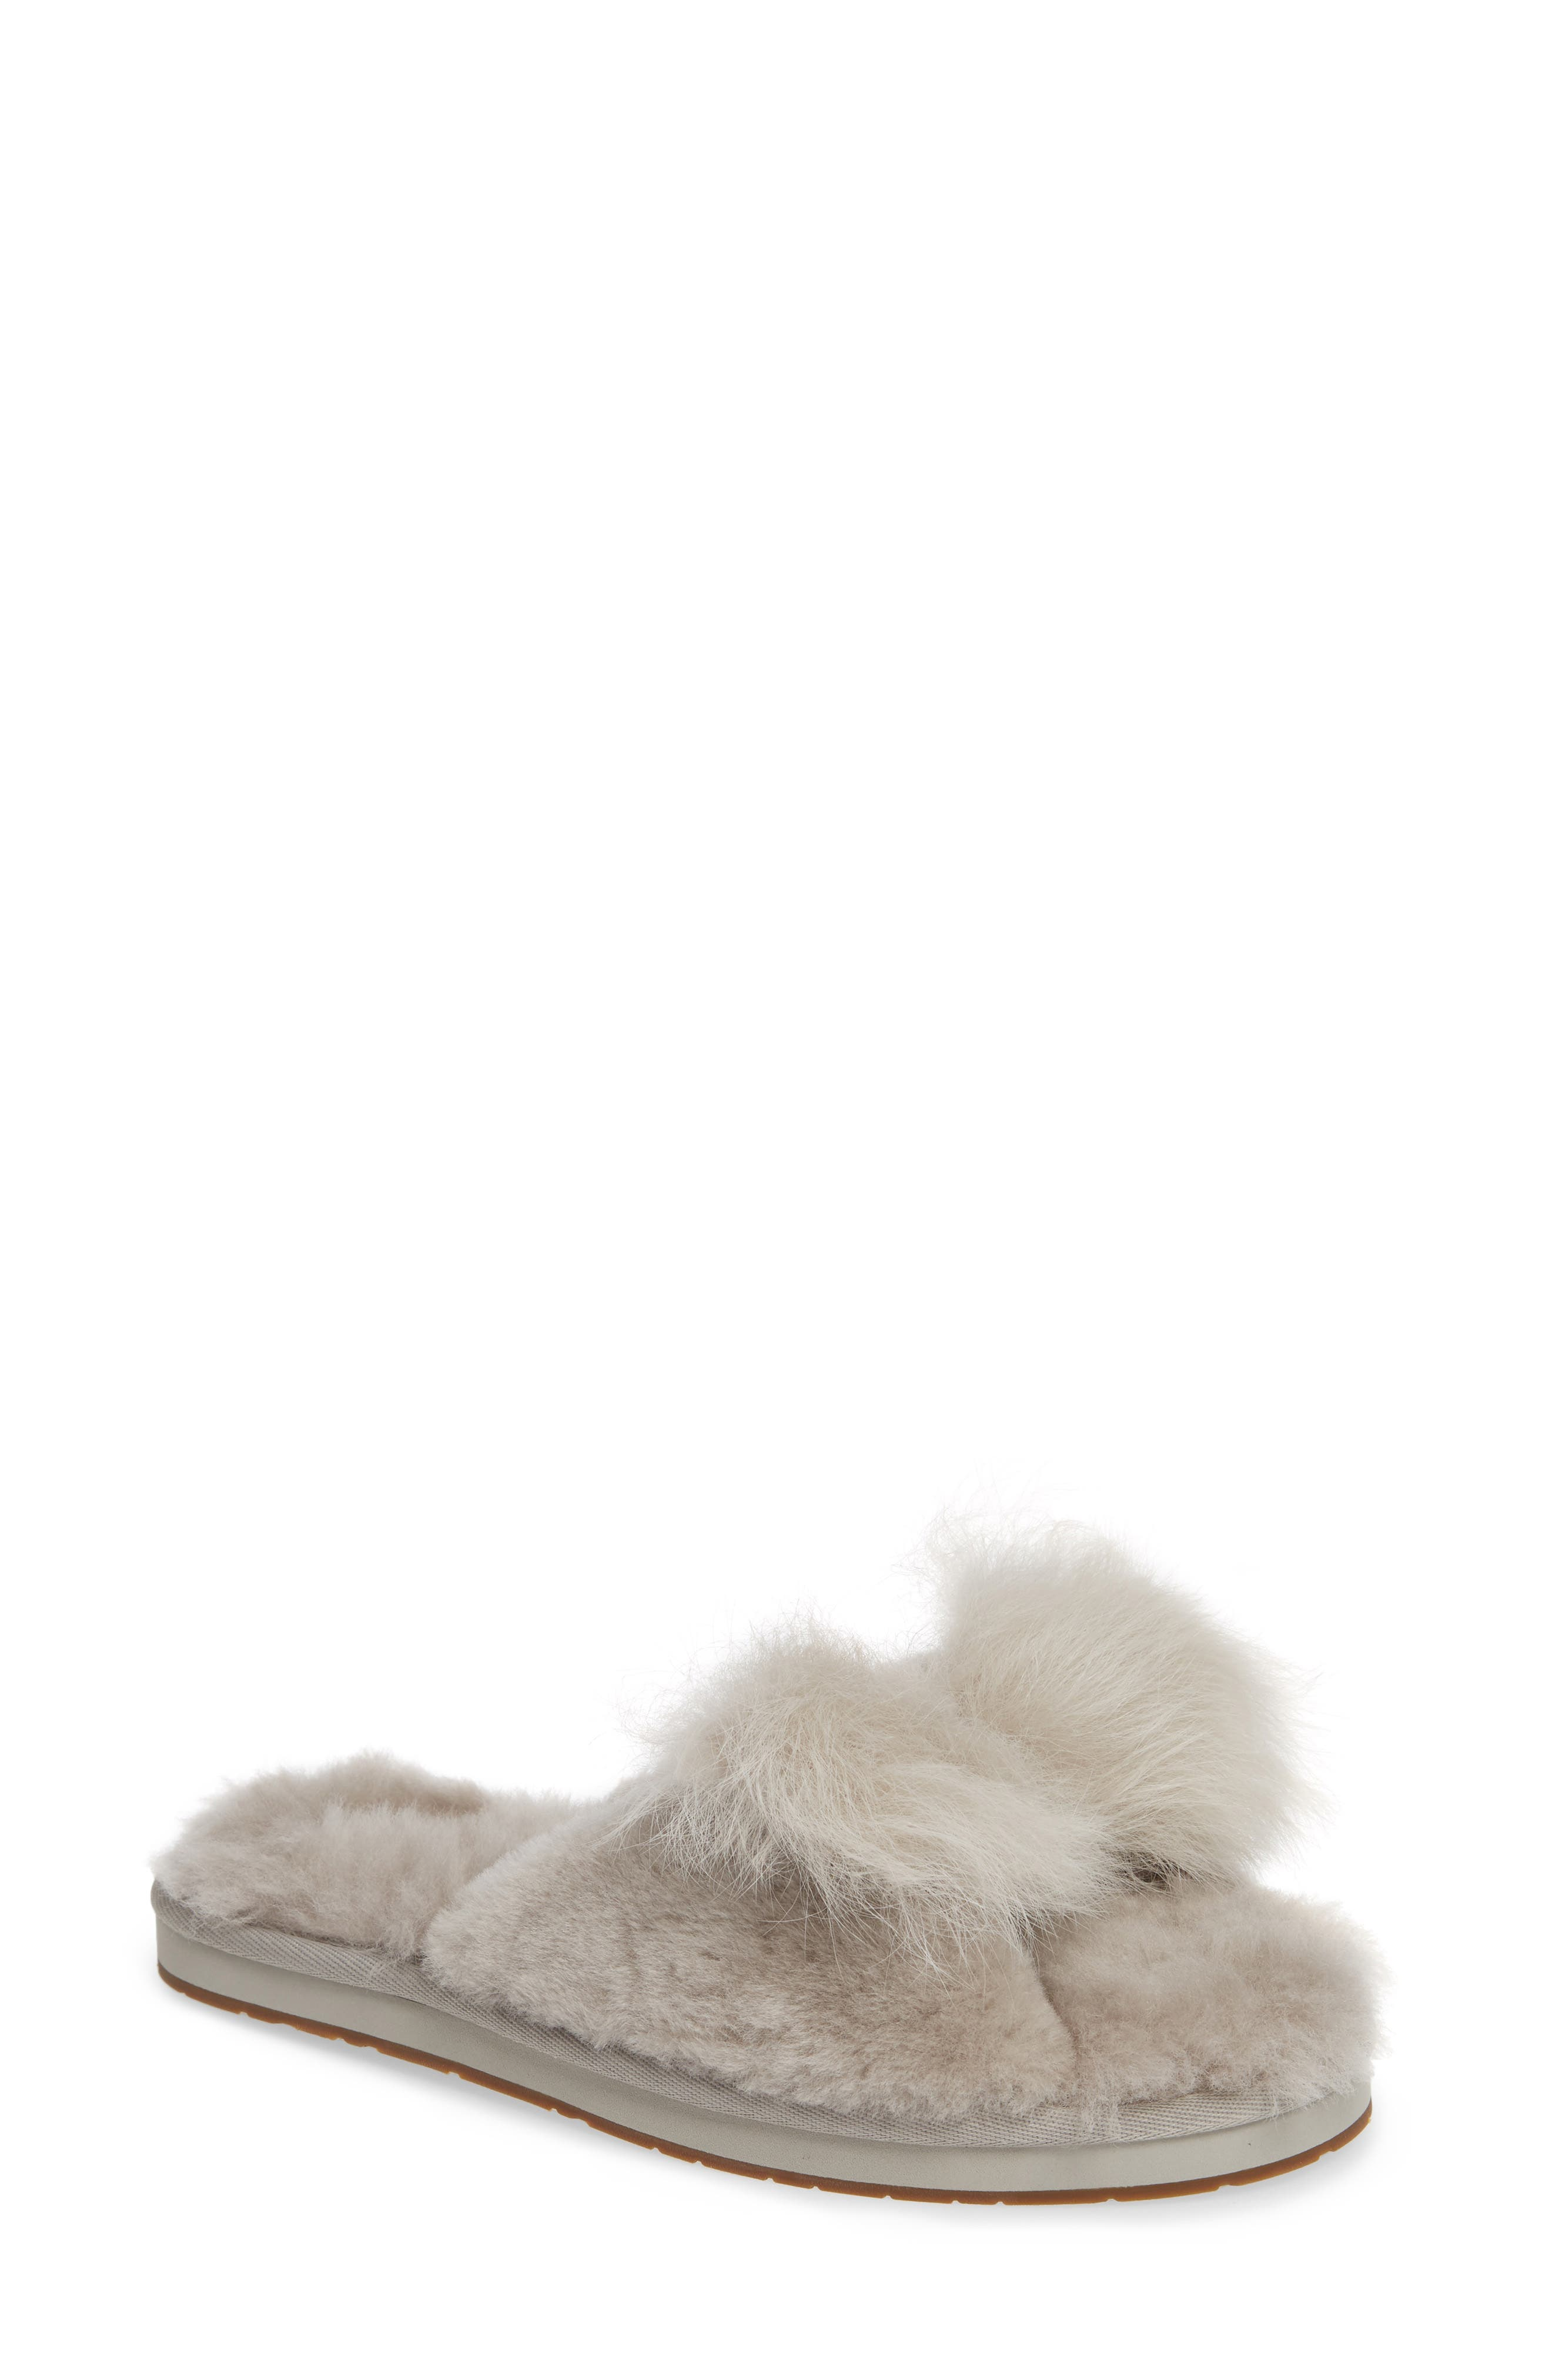 Ugg Mirabelle Genuine Shearling Slipper, Grey